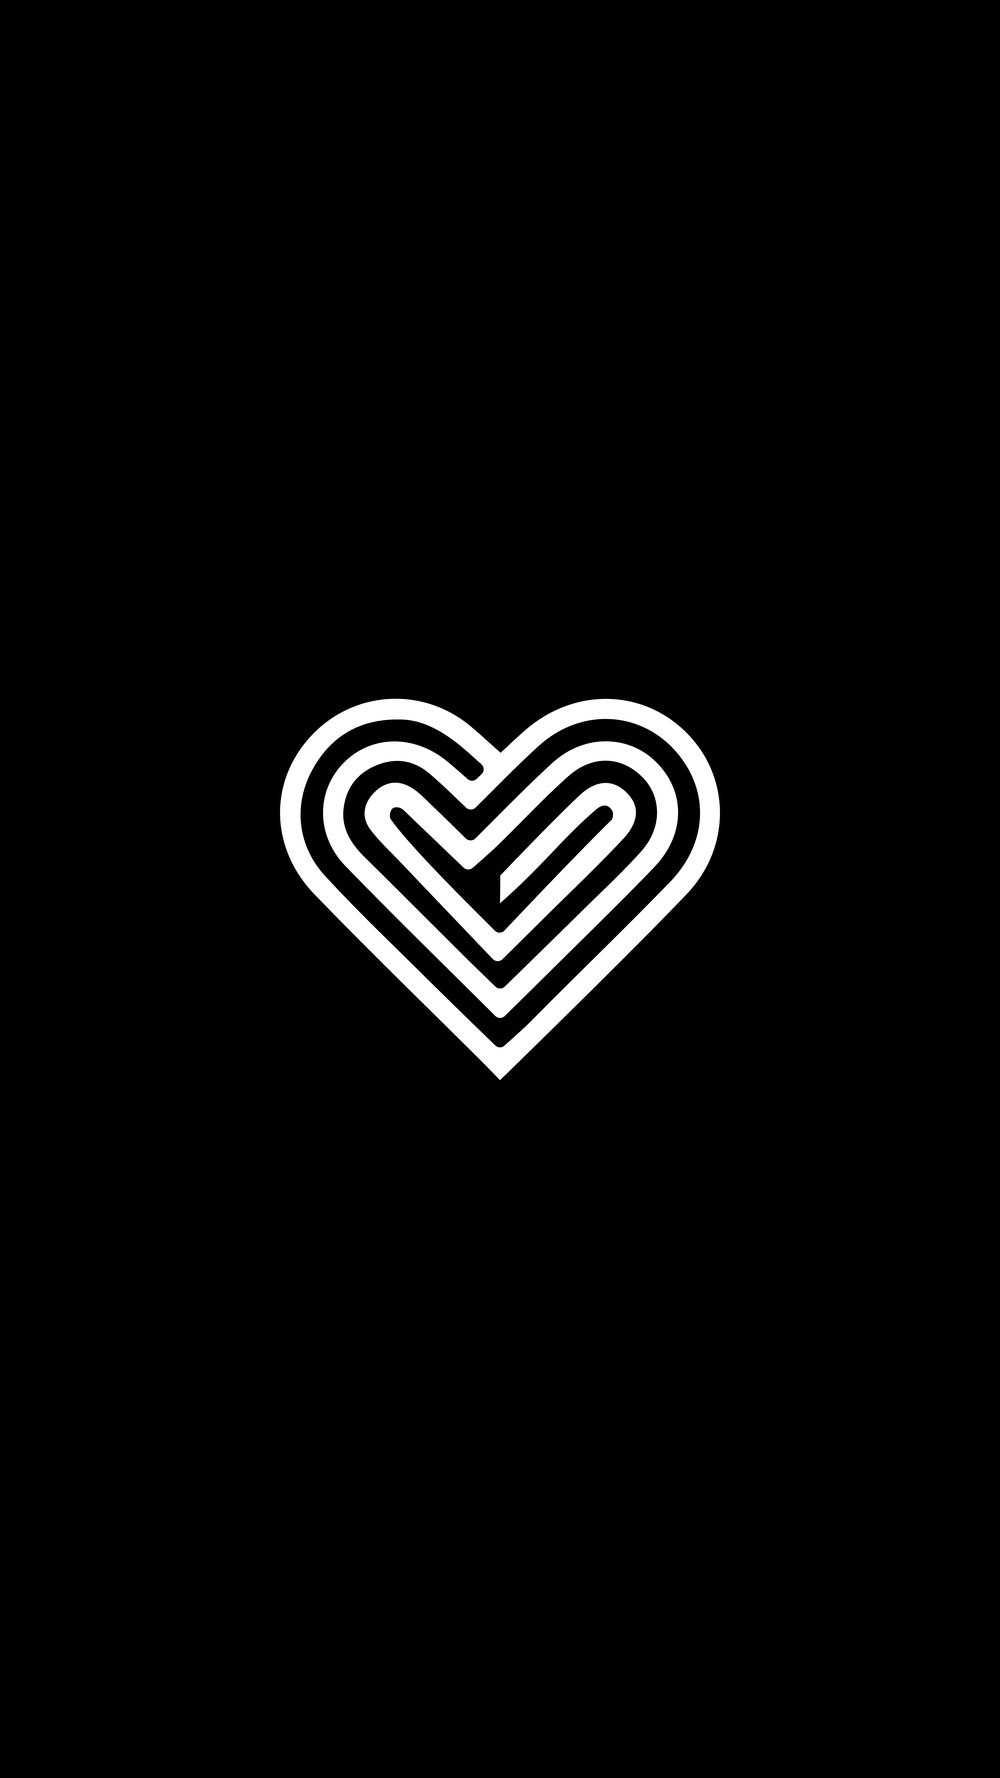 Heart Icon Black.jpg